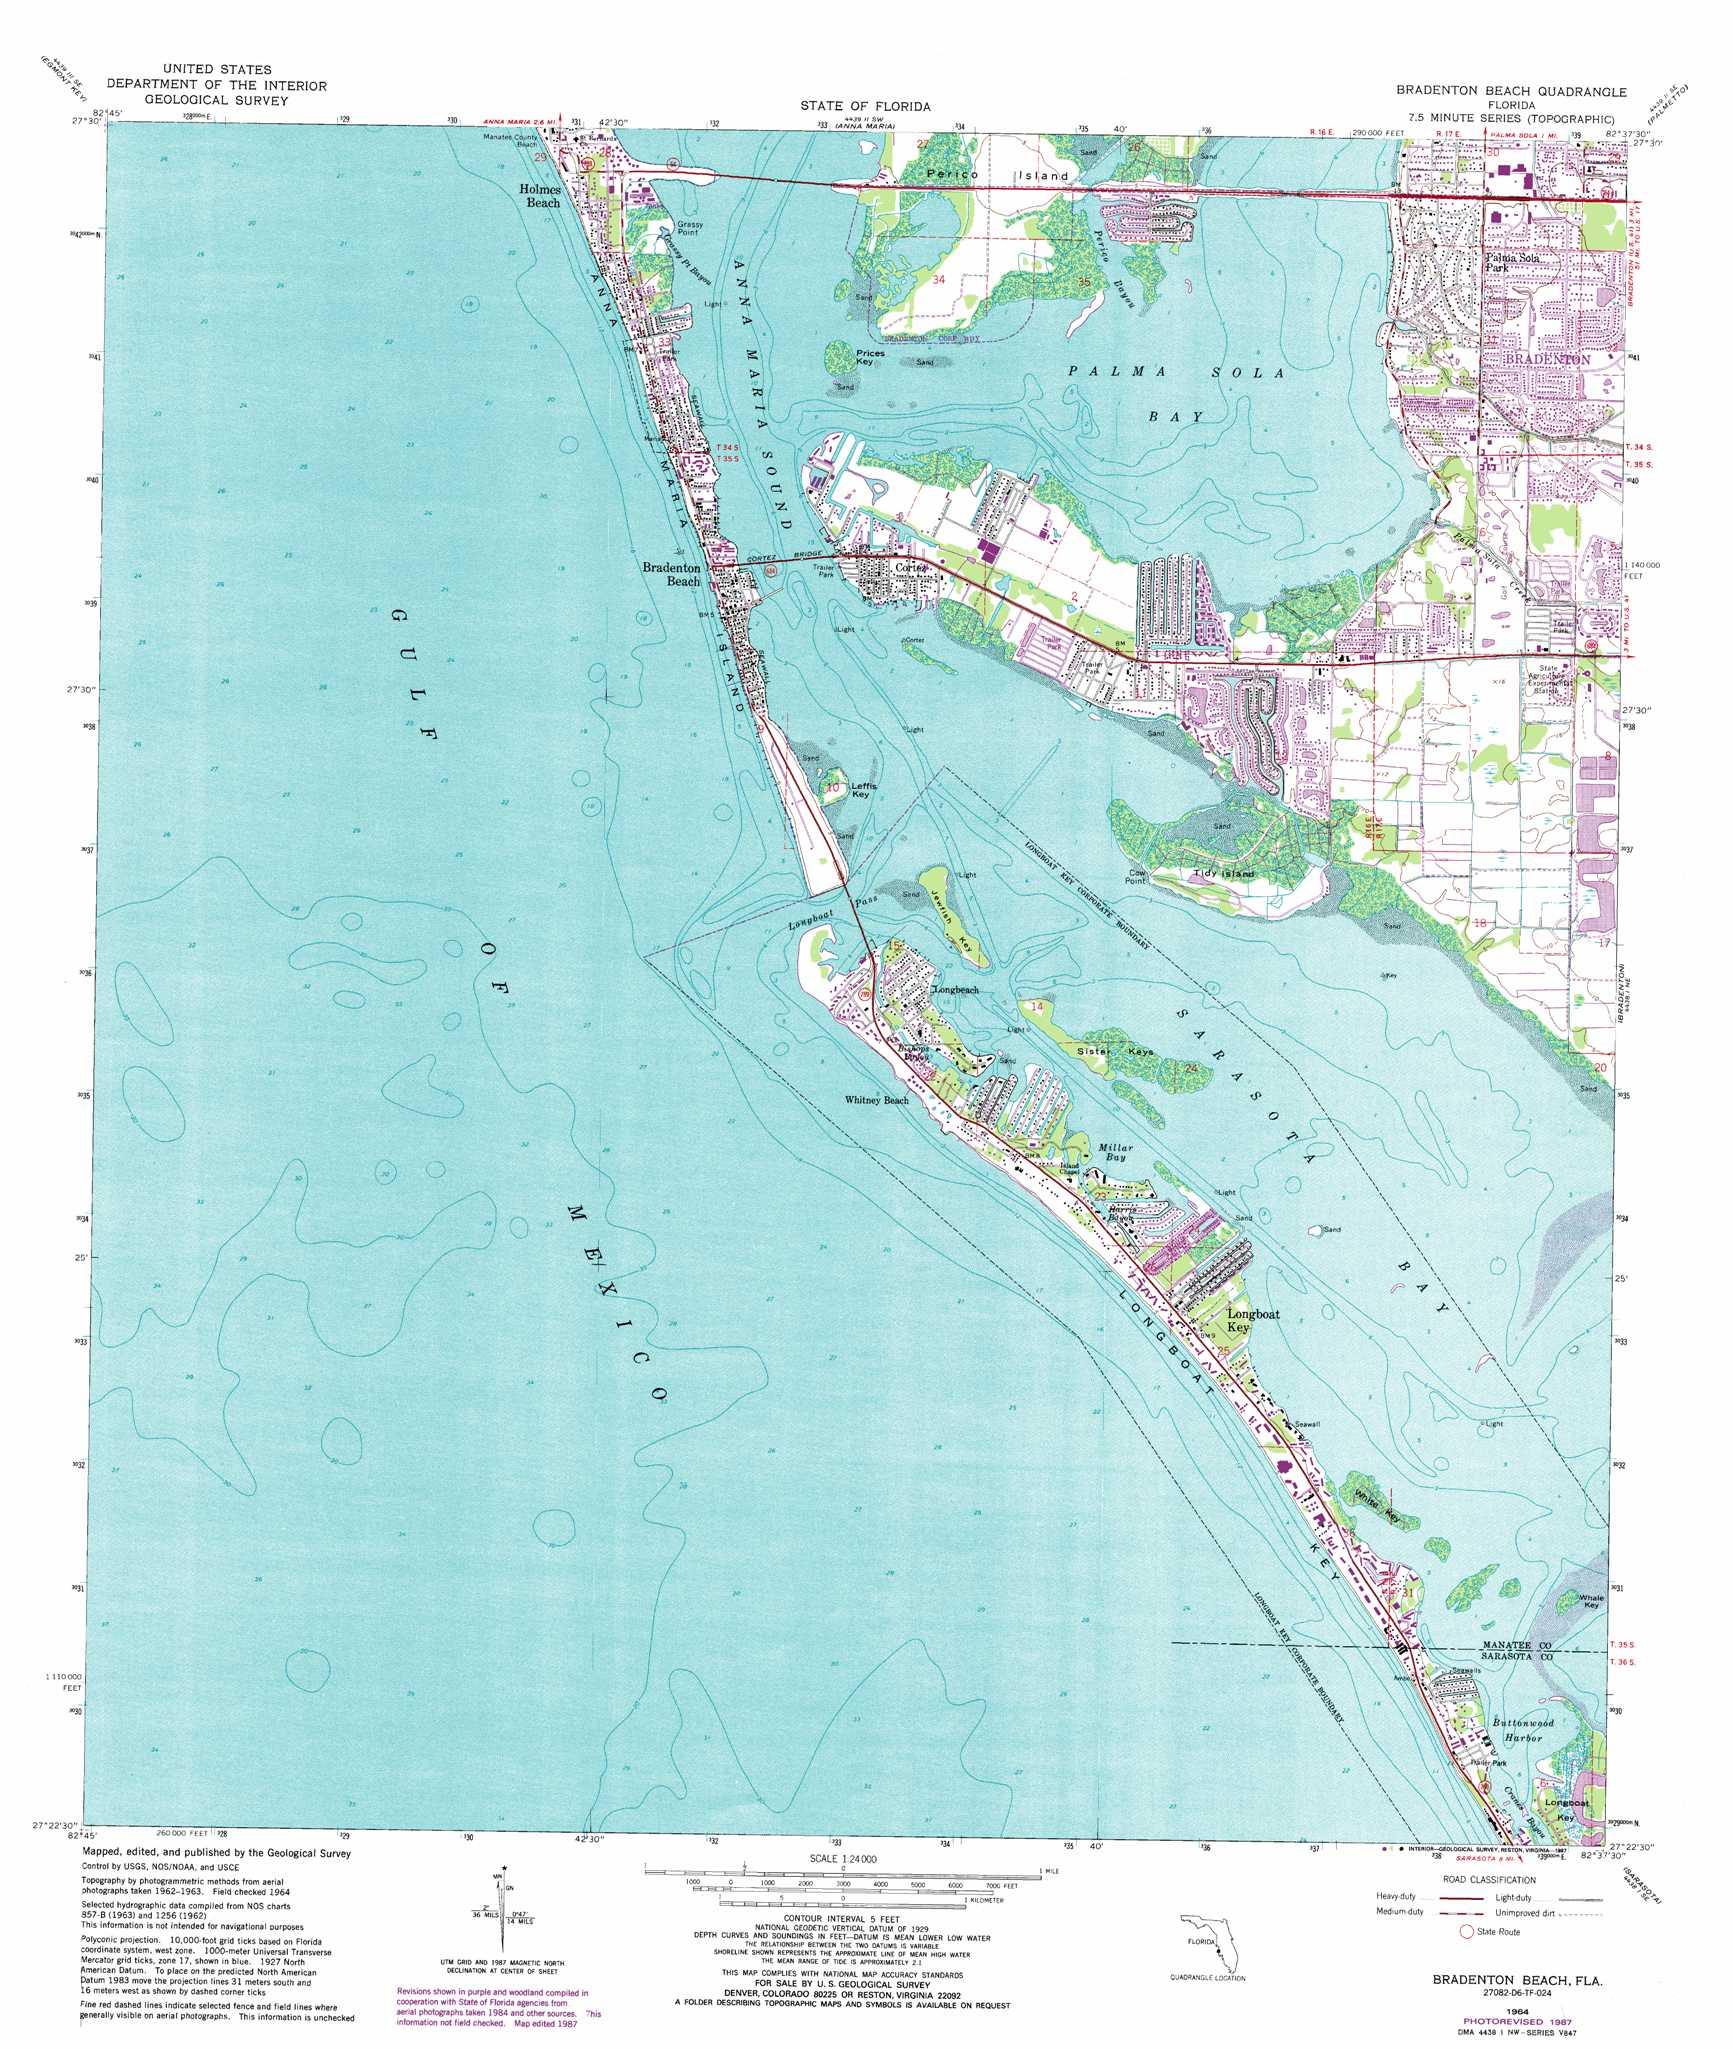 bradenton beach topographic map, fl - usgs topo quad 27082d6